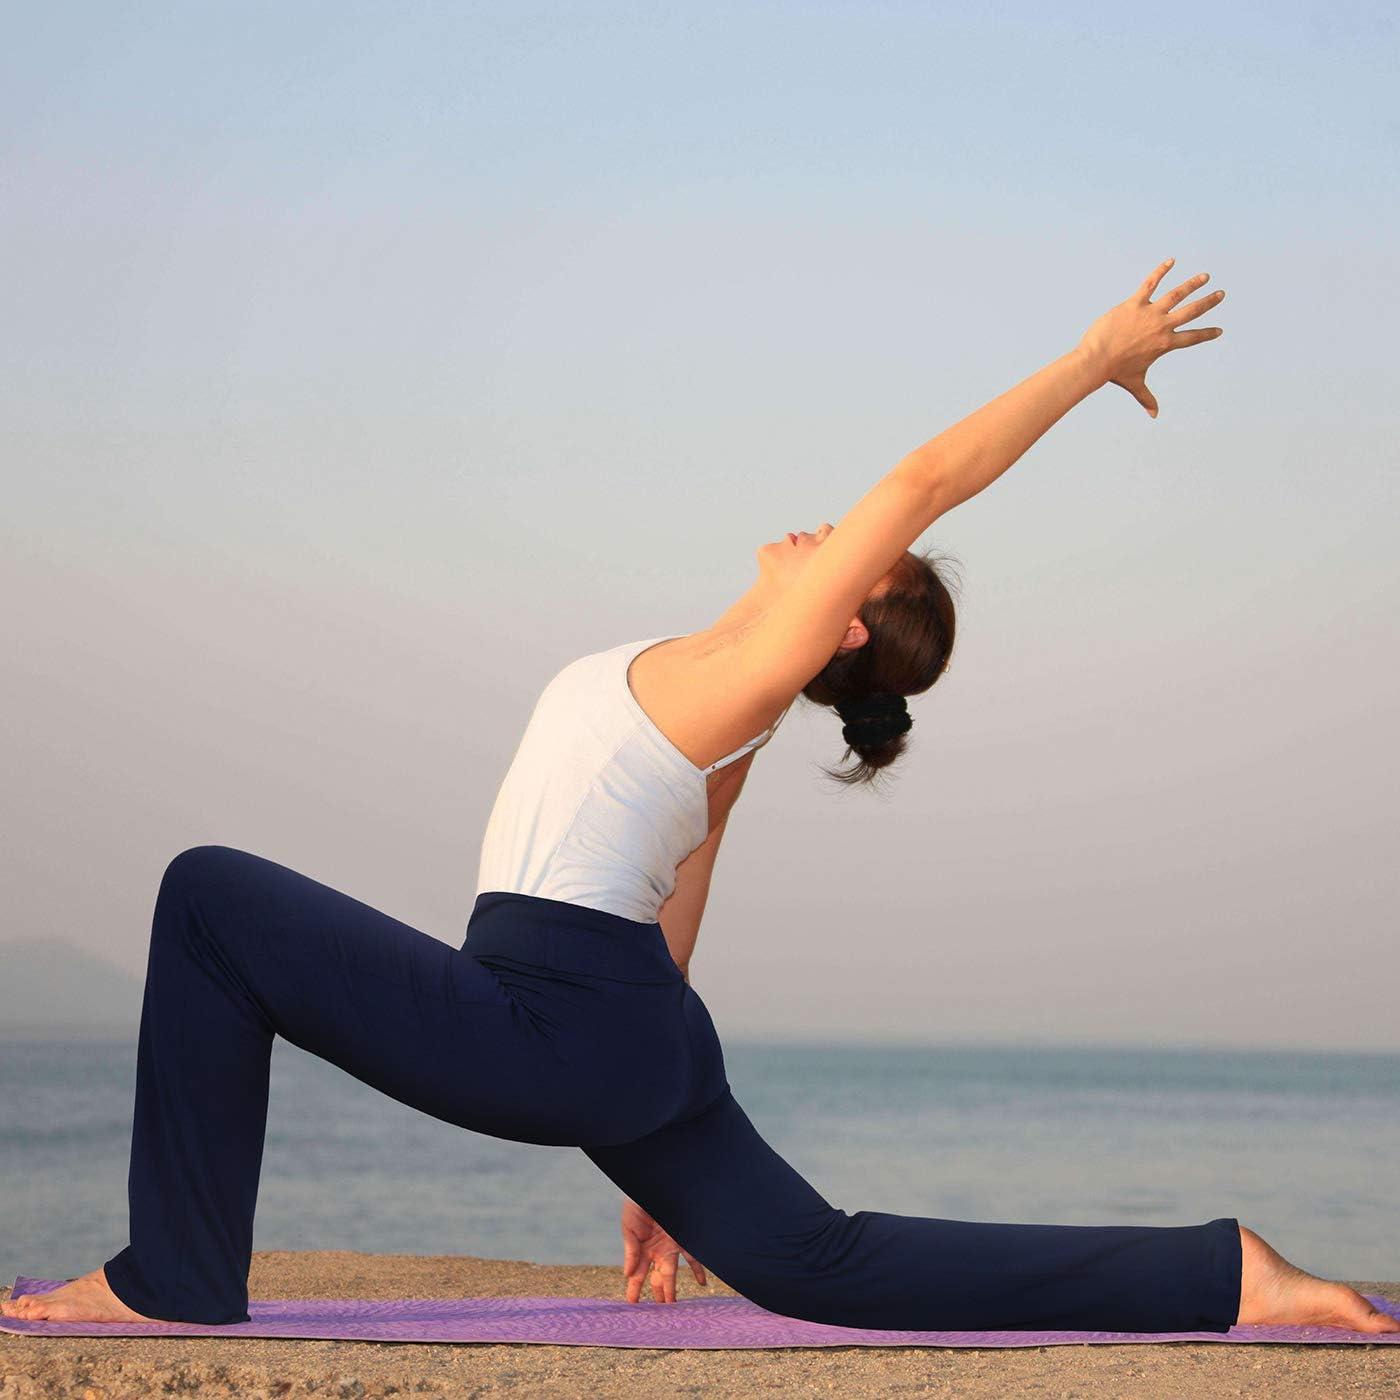 HDE Womens Color Block Fold Over Waist Yoga Pants Flare Leg Workout Leggings